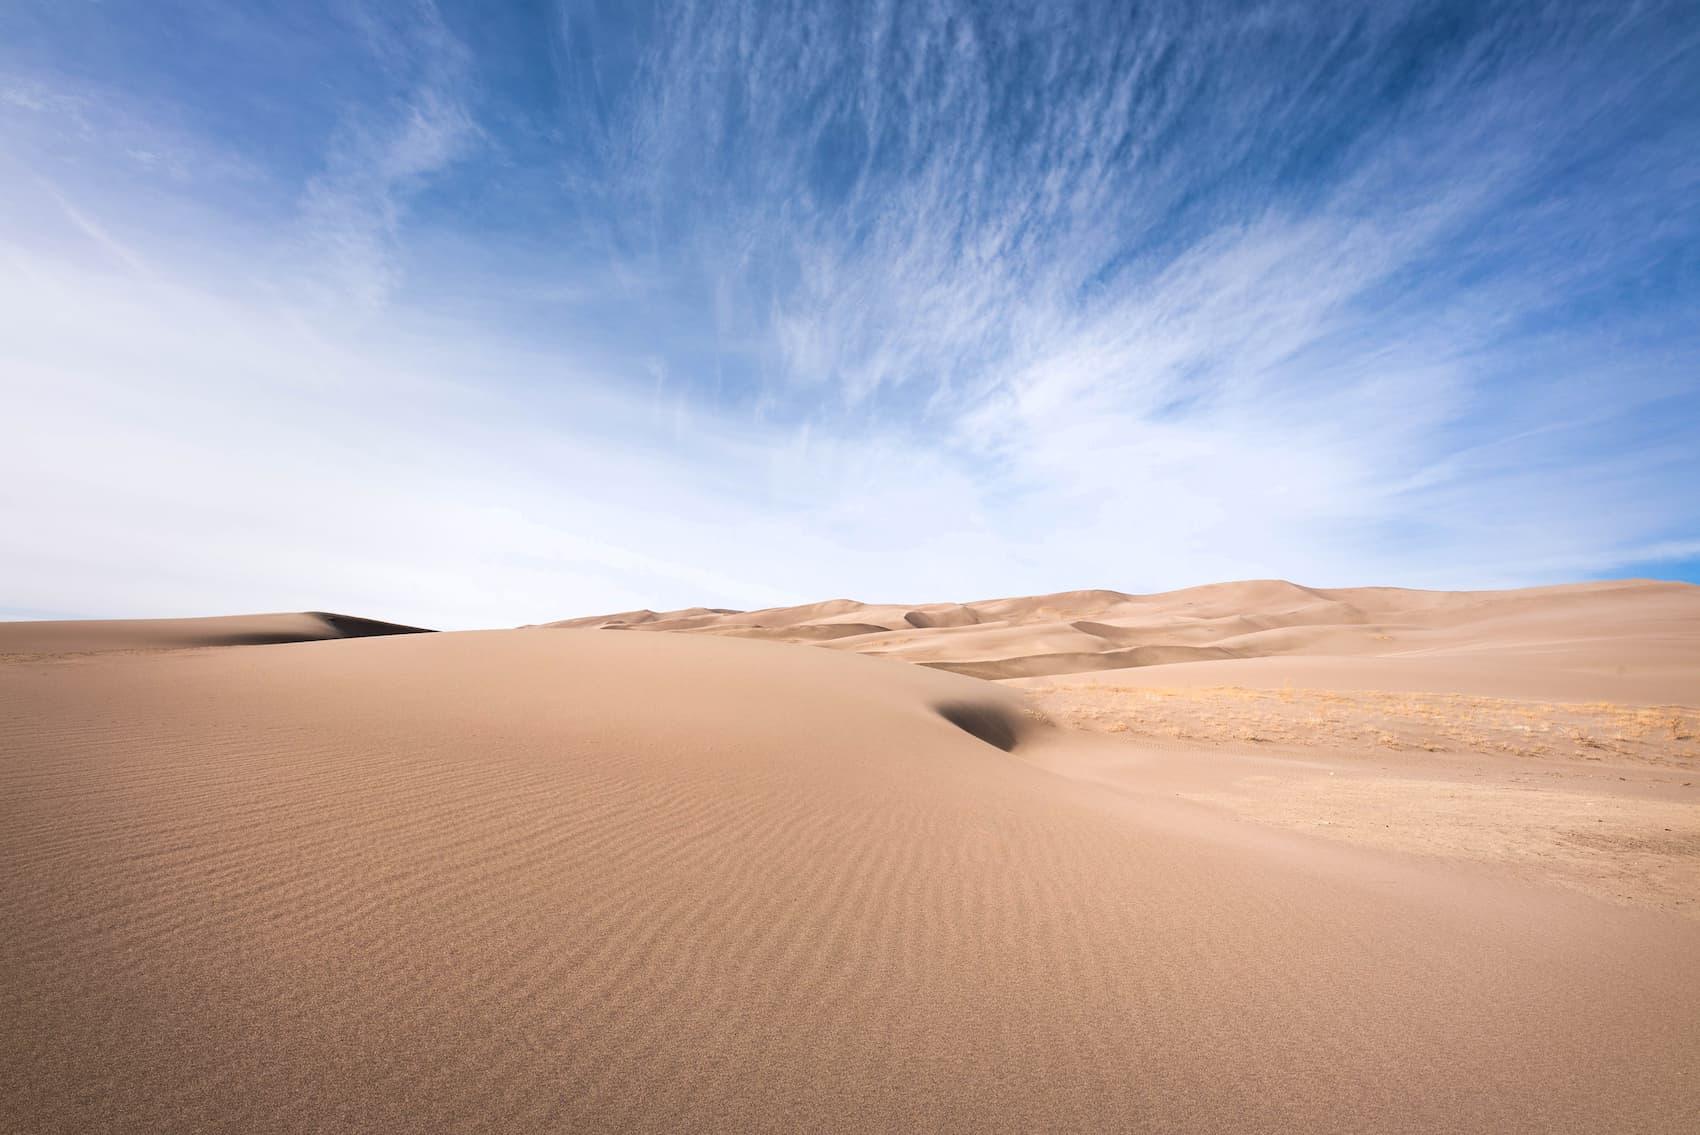 desert destination wedding locations in the us